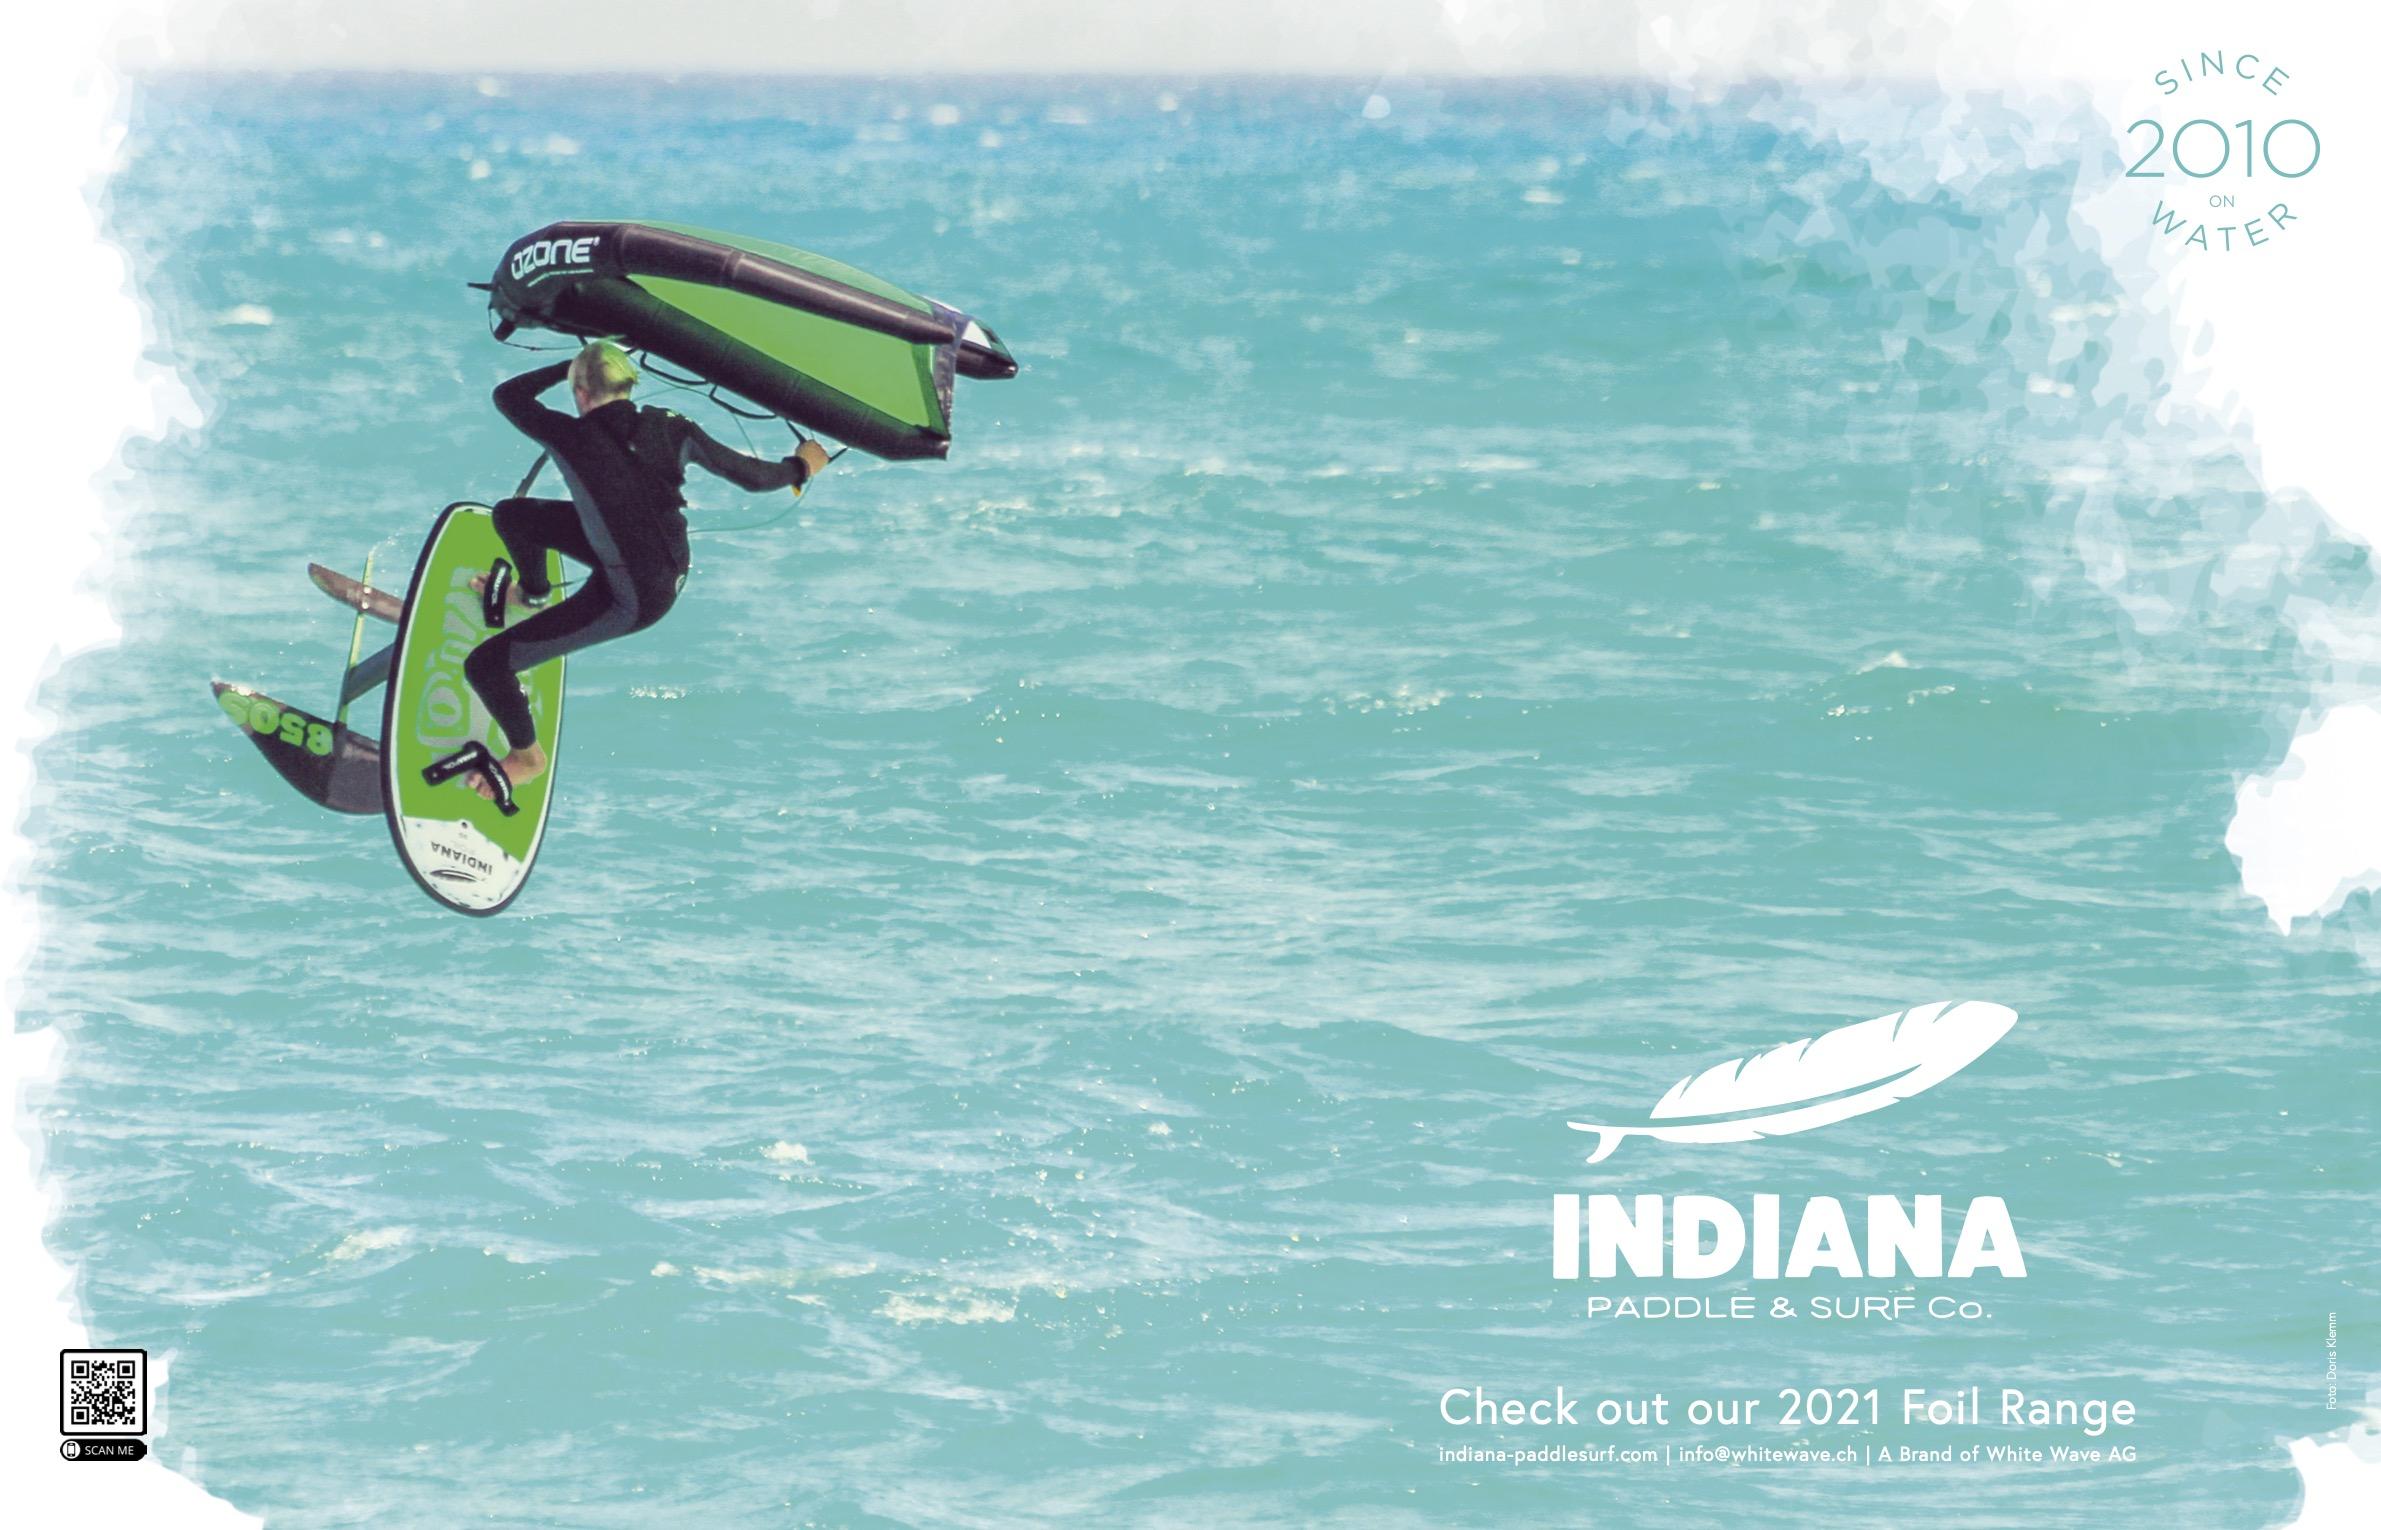 106 INDIANA SUP